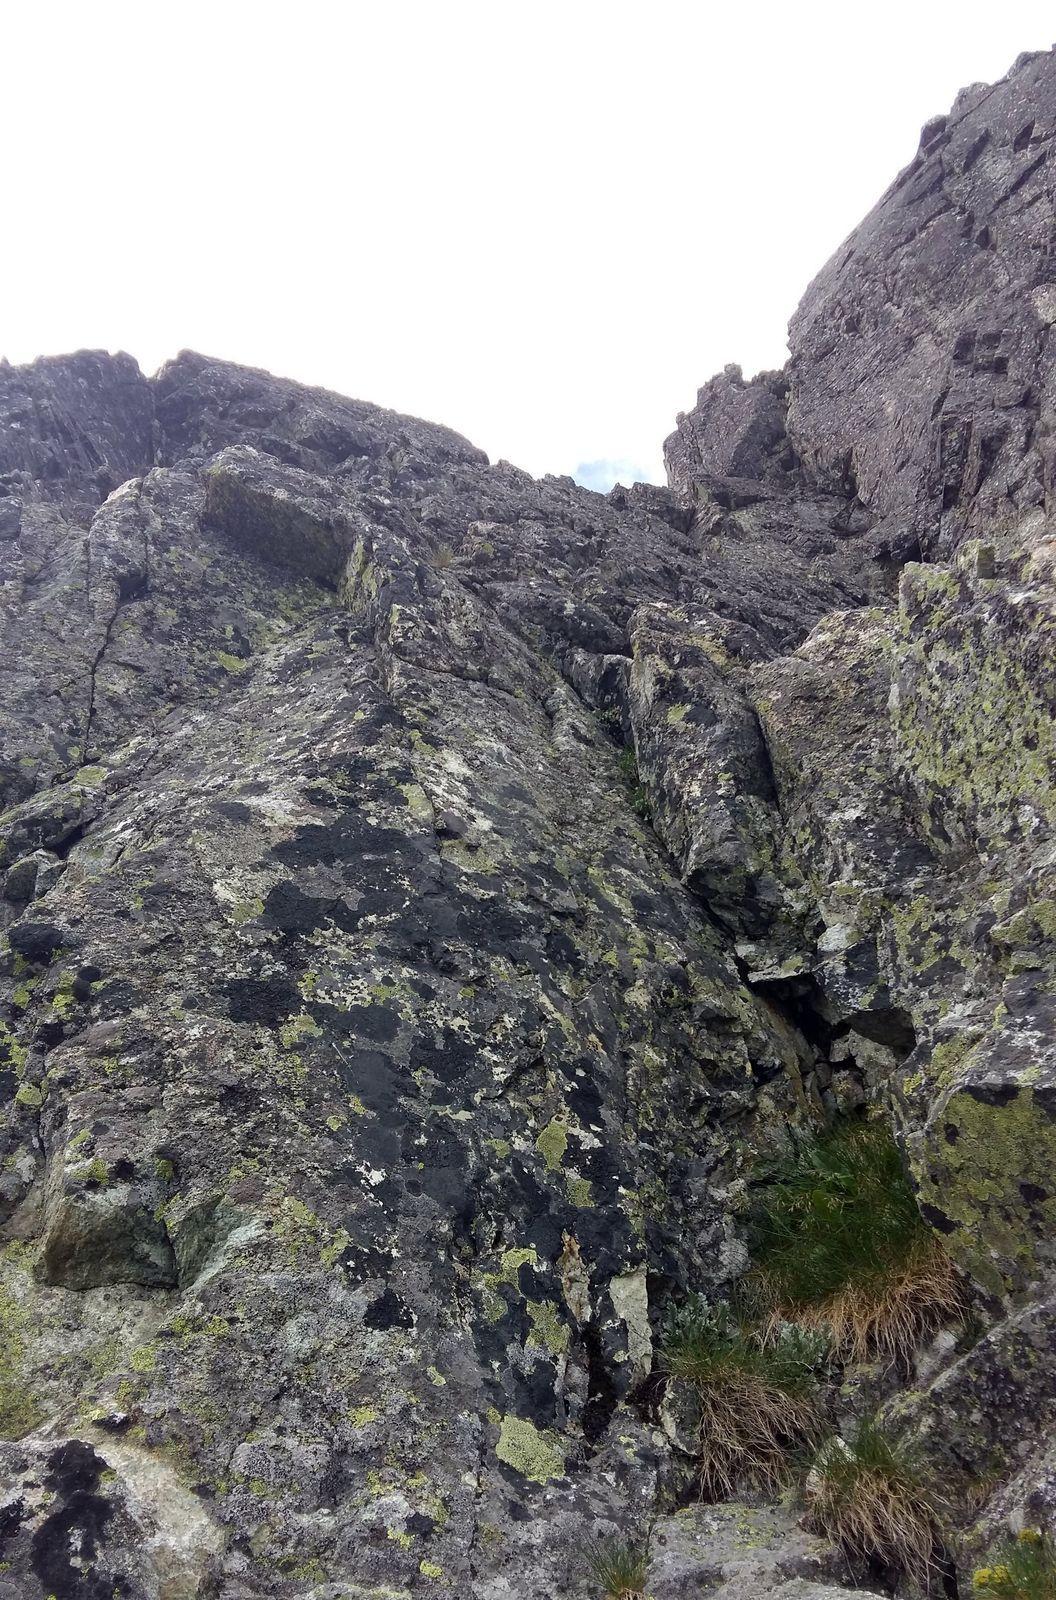 Rebrom na V vrchol, Kele – Šuna